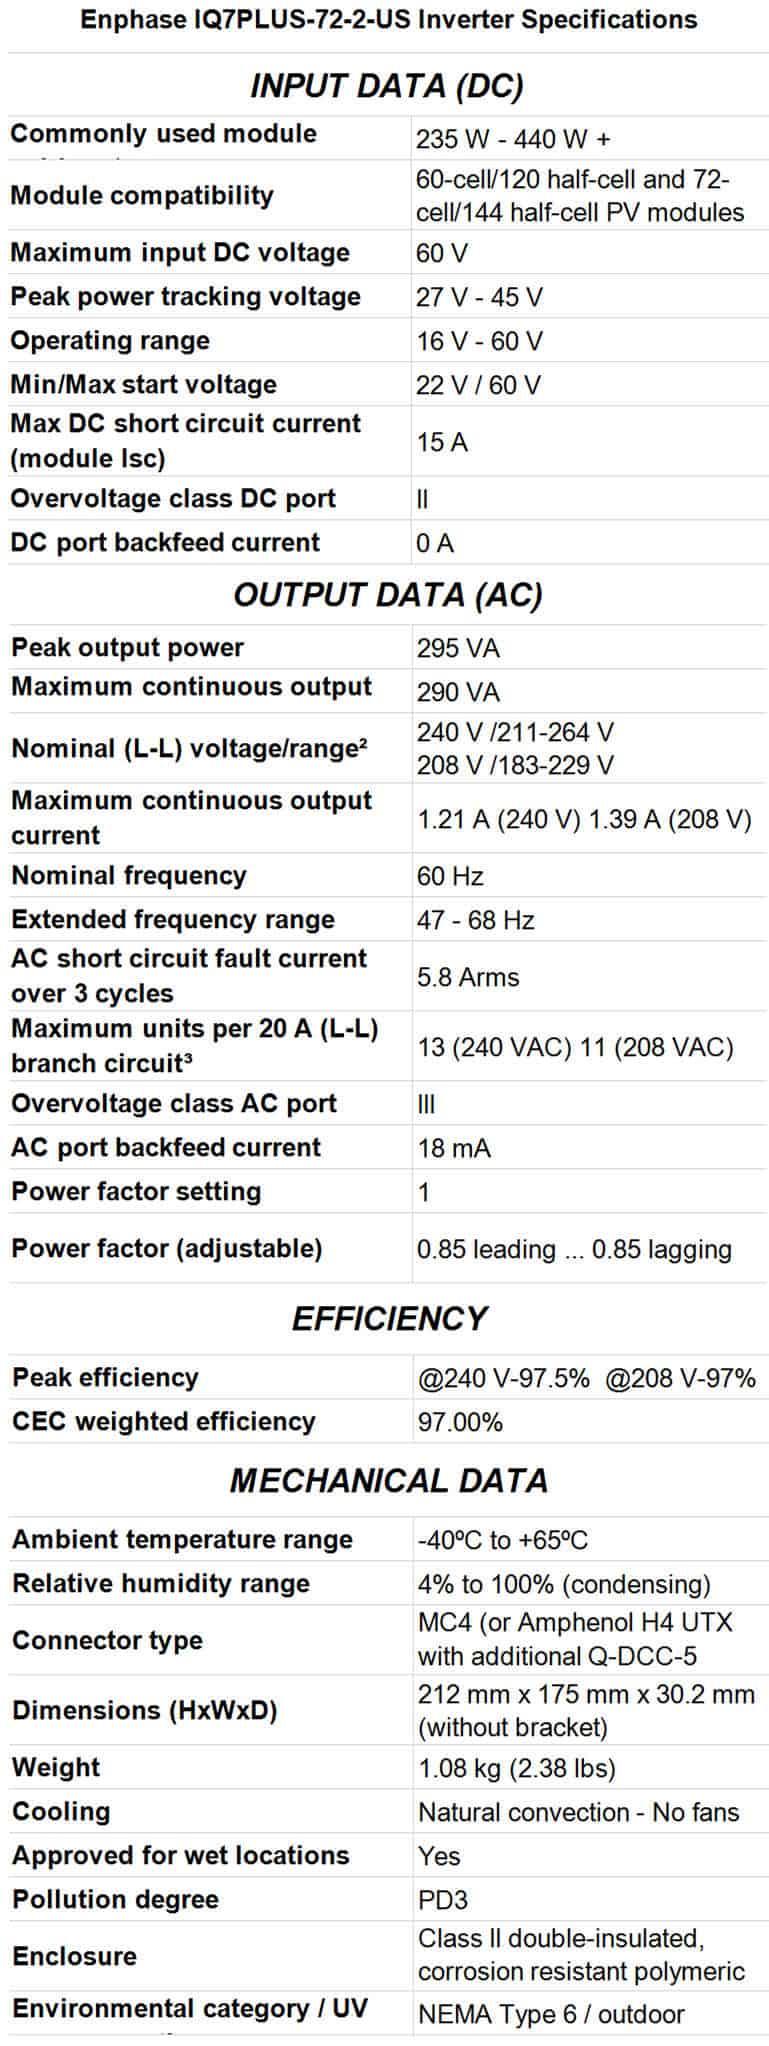 best solar inverters Enphase IQ7PLUS-72-2-US Inverter Specifications